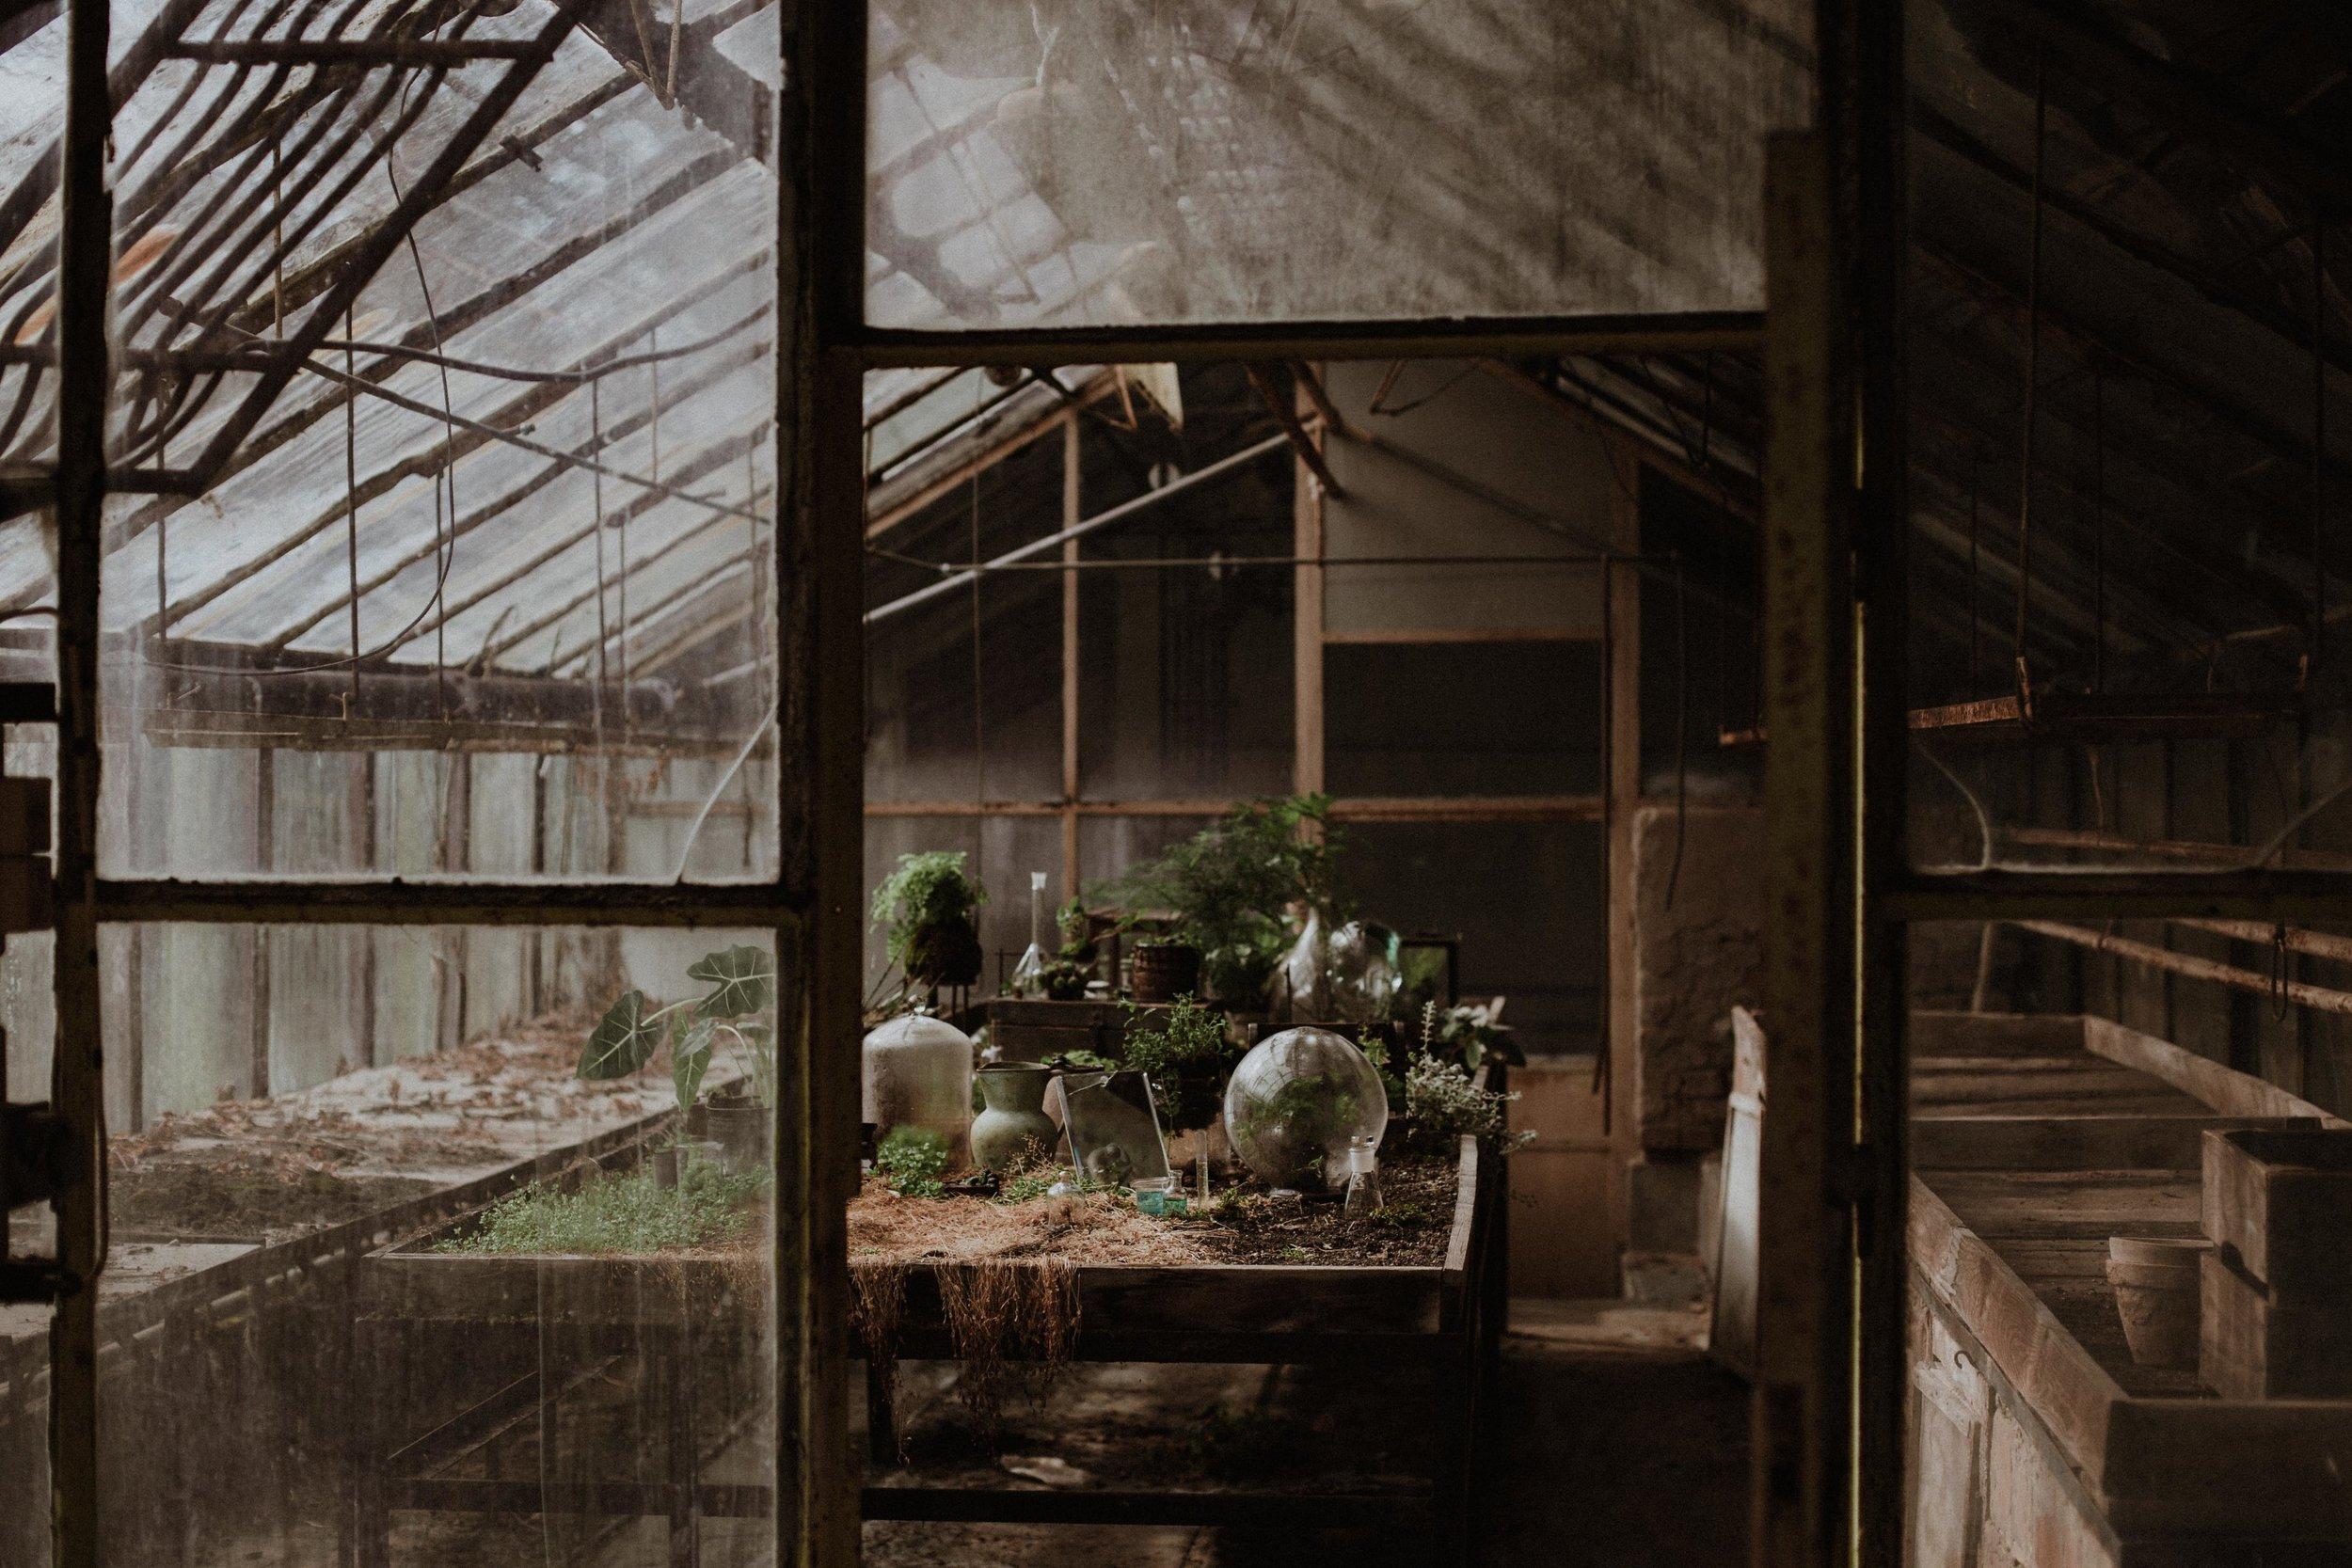 20170321_greenhouse_stsh_w_018__MG_6456.jpg